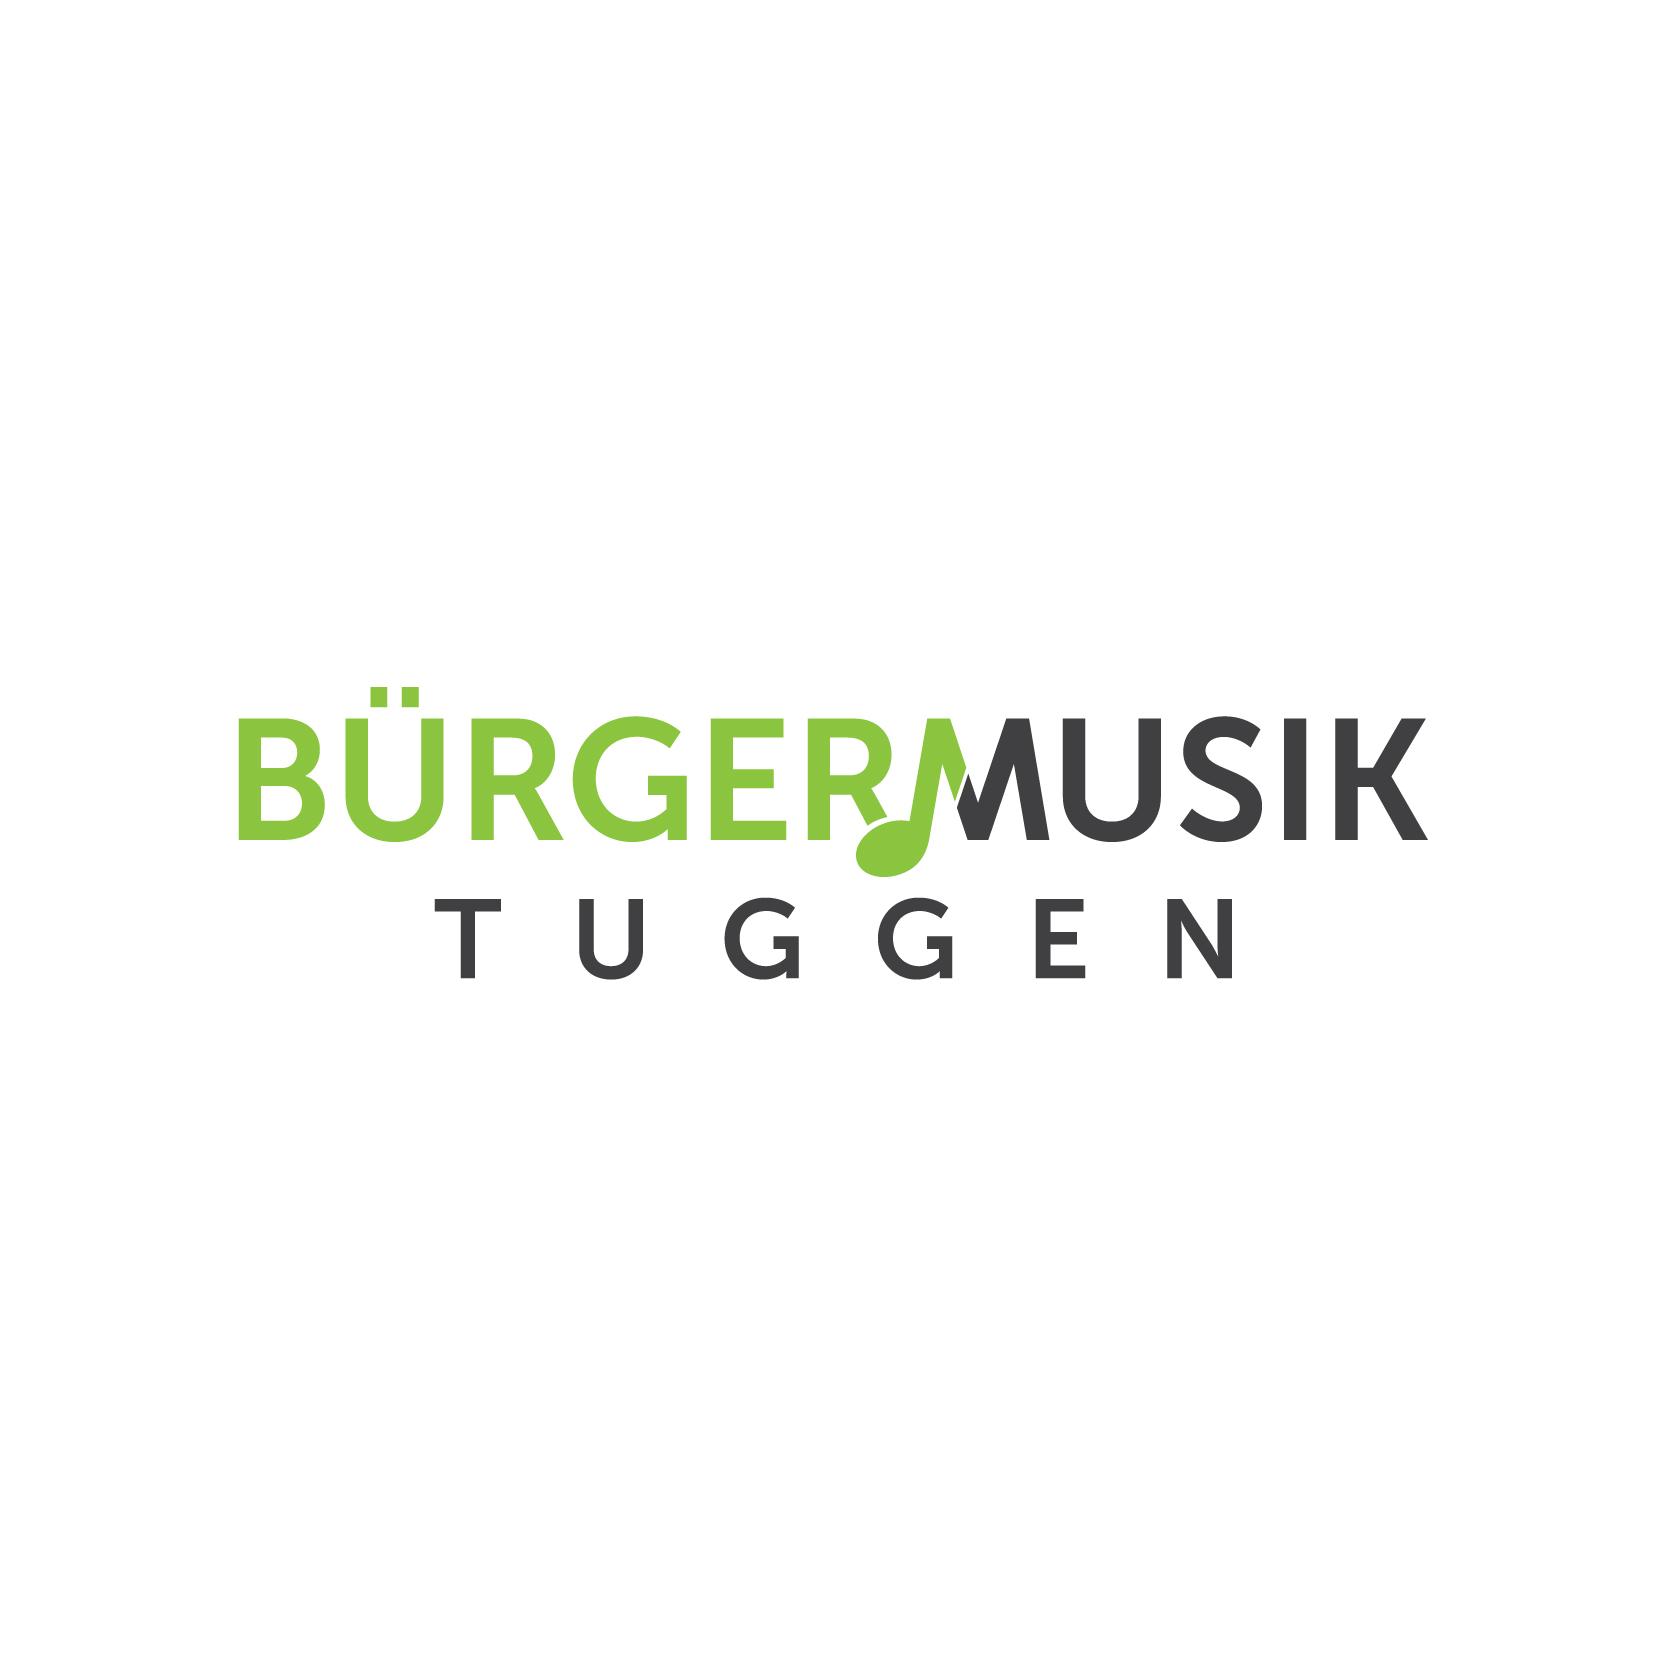 Bürgermusik Tuggen